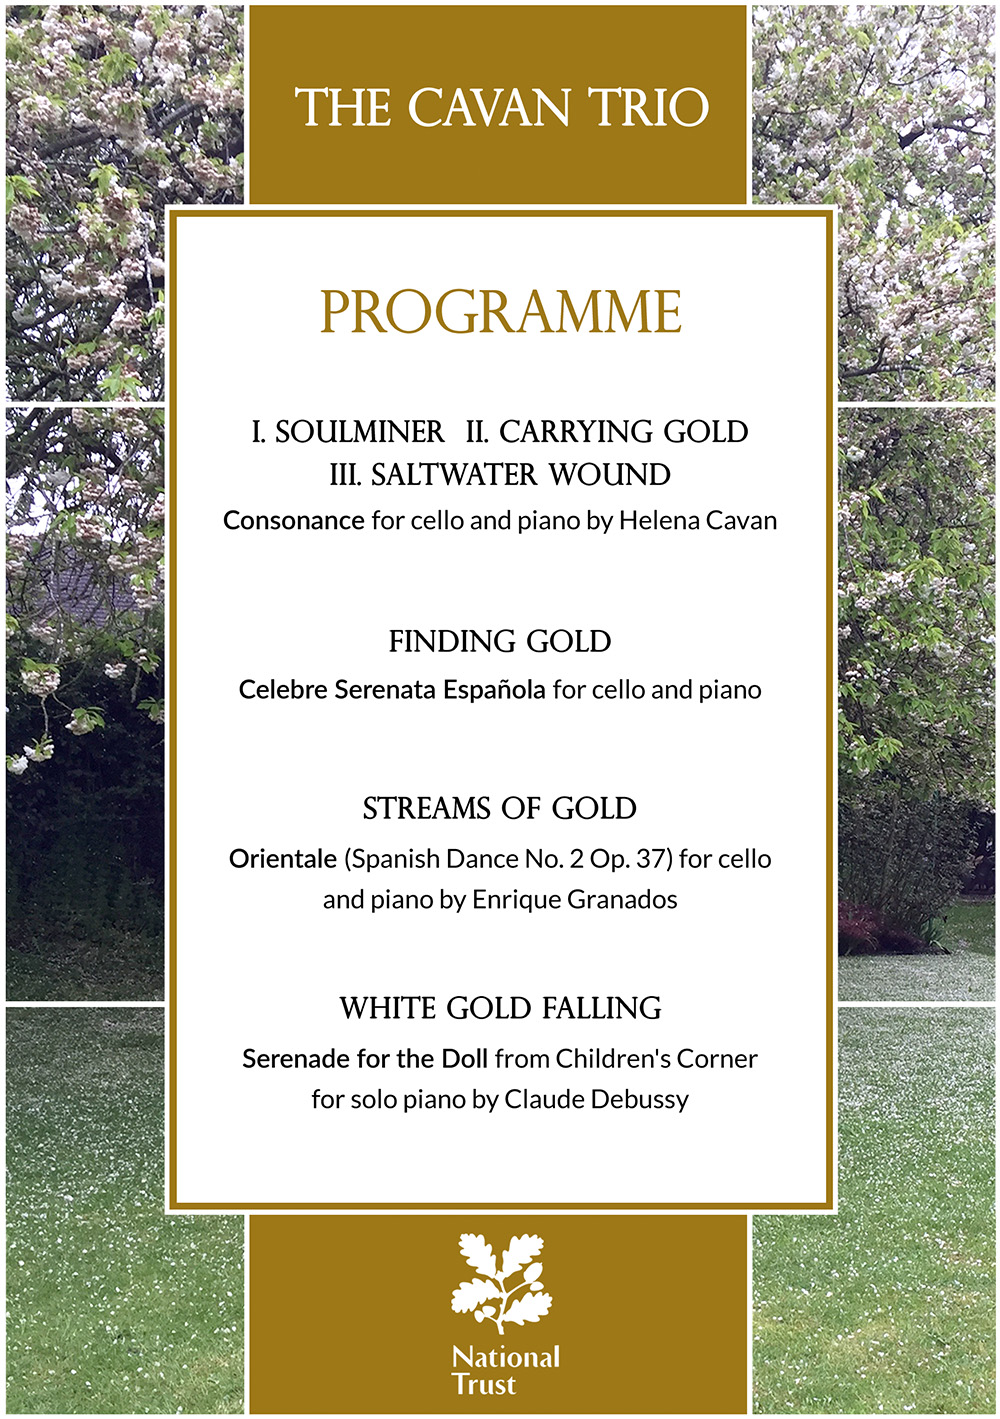 Streams of gold programme 2.jpg